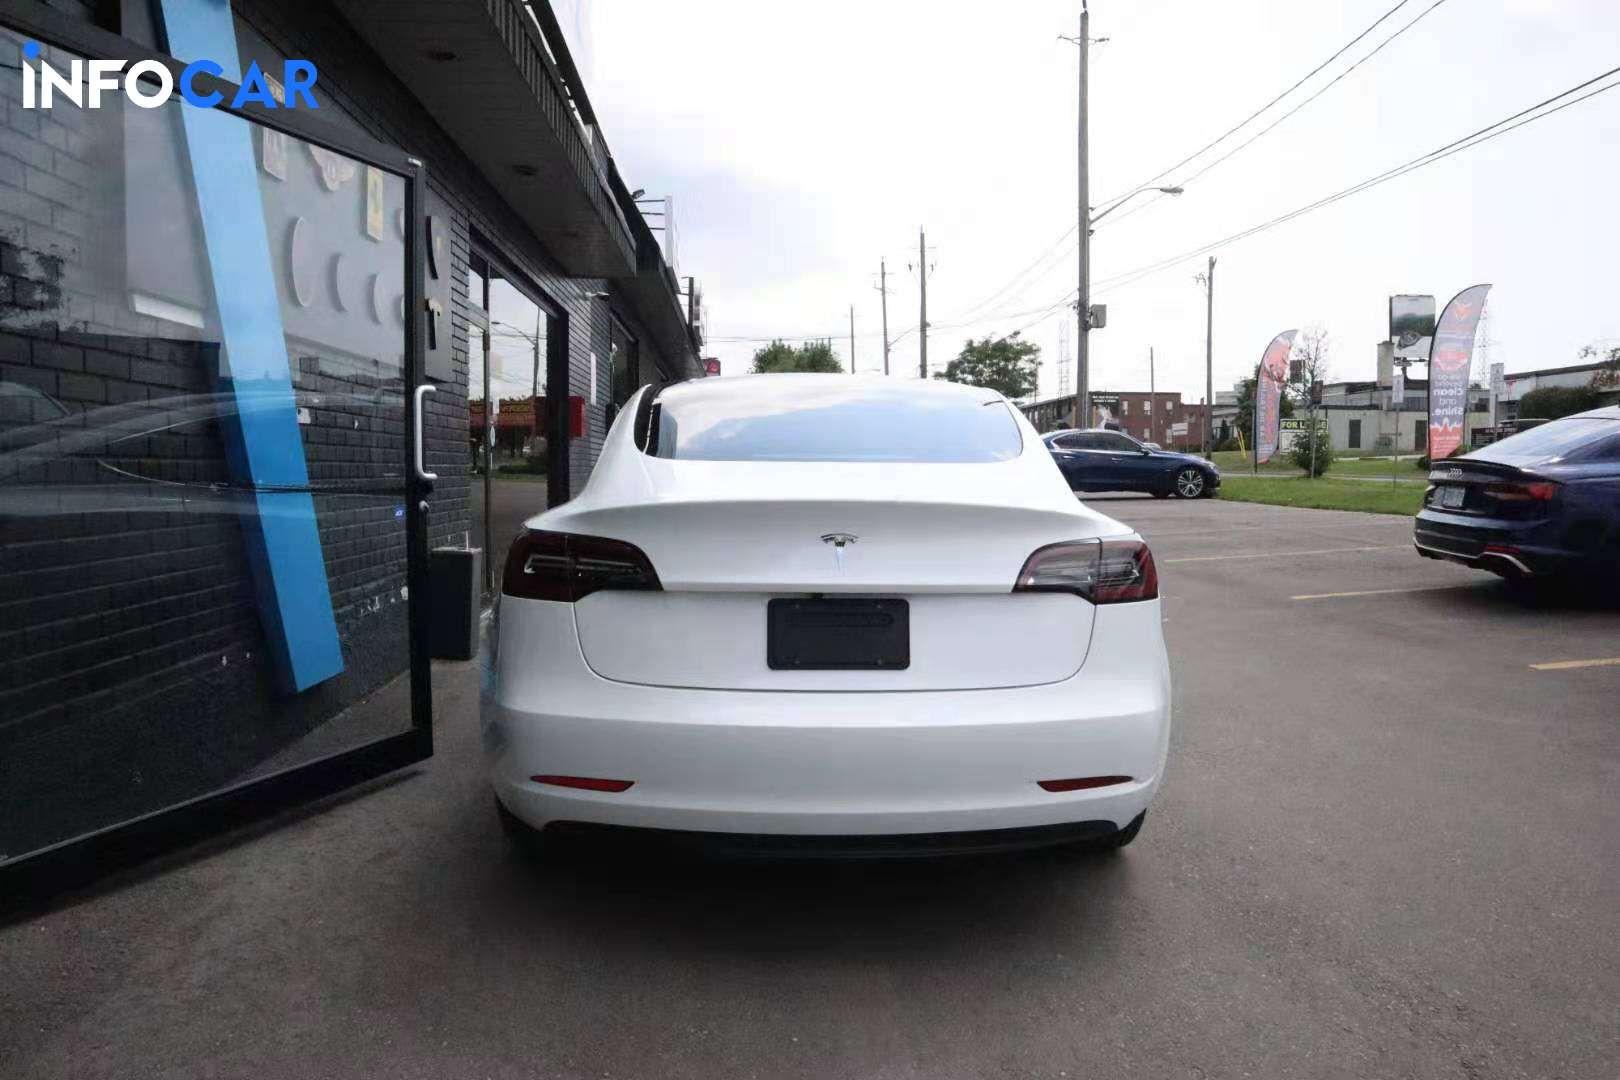 2019 Tesla Model 3  stand range plus - INFOCAR - Toronto's Most Comprehensive New and Used Auto Trading Platform